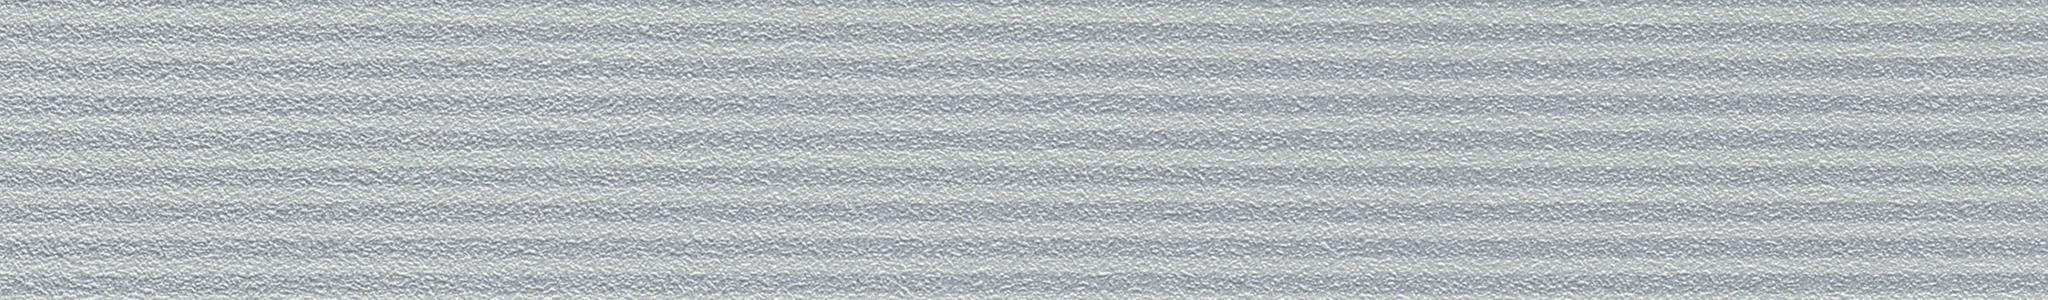 HD 298008 ABS Kante Dekor Silber Alu perl